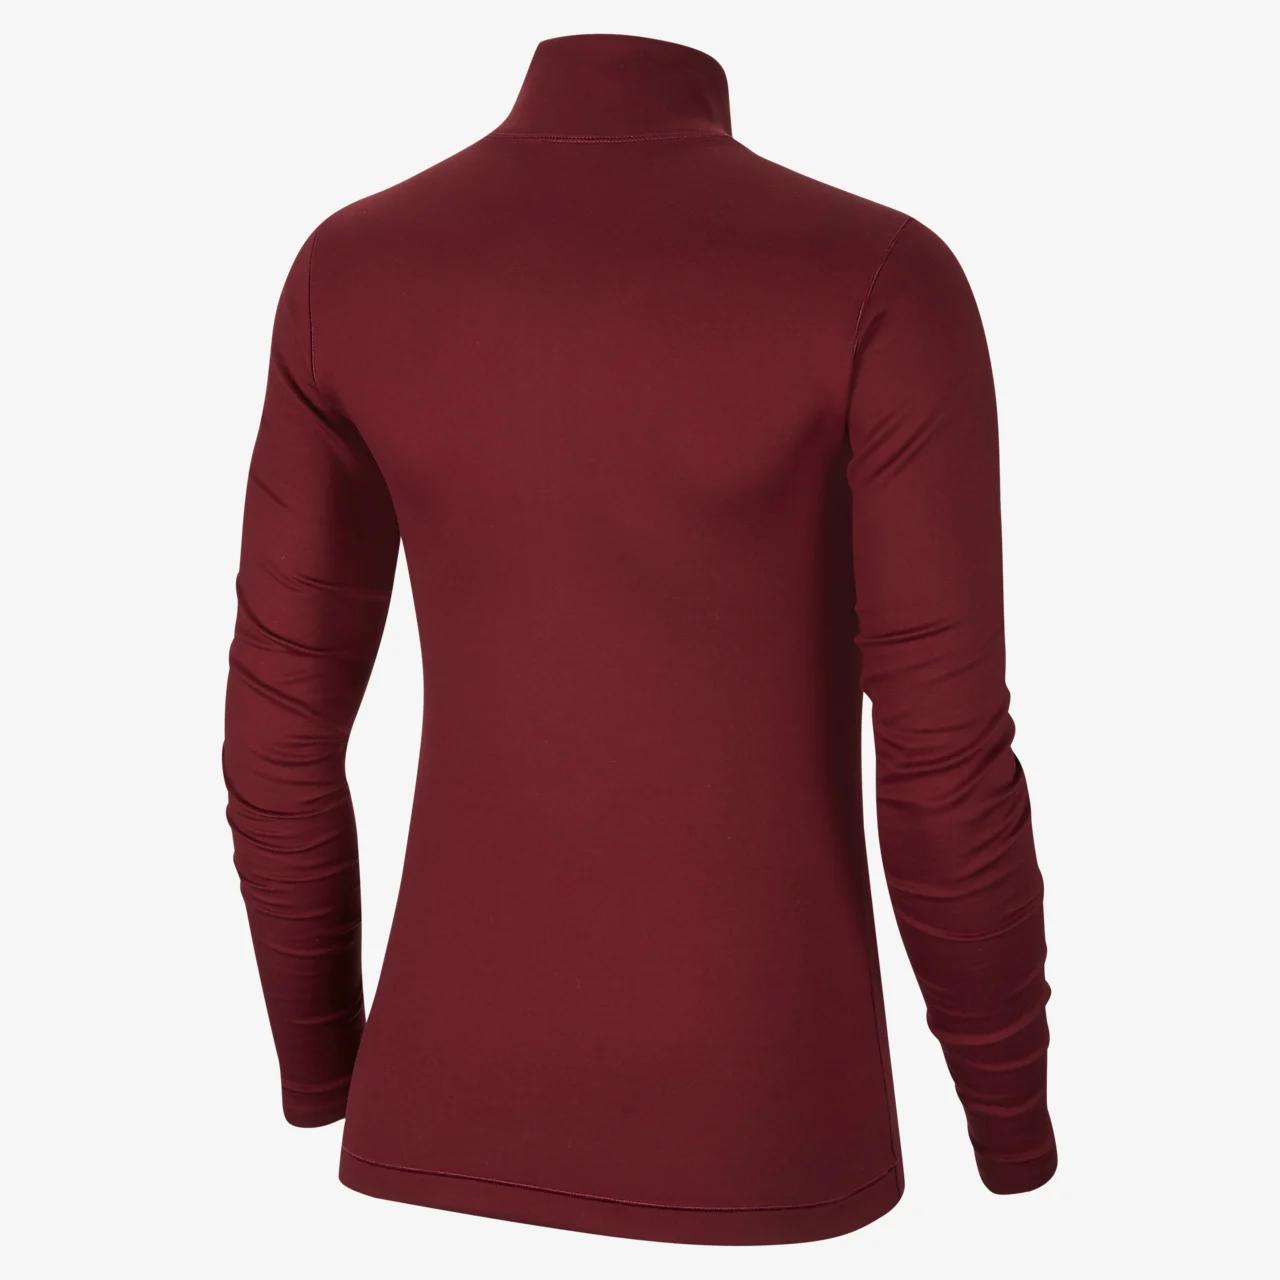 Nike Pro Warm Women's Long-Sleeve 1/2-Zip Top CU4329-638